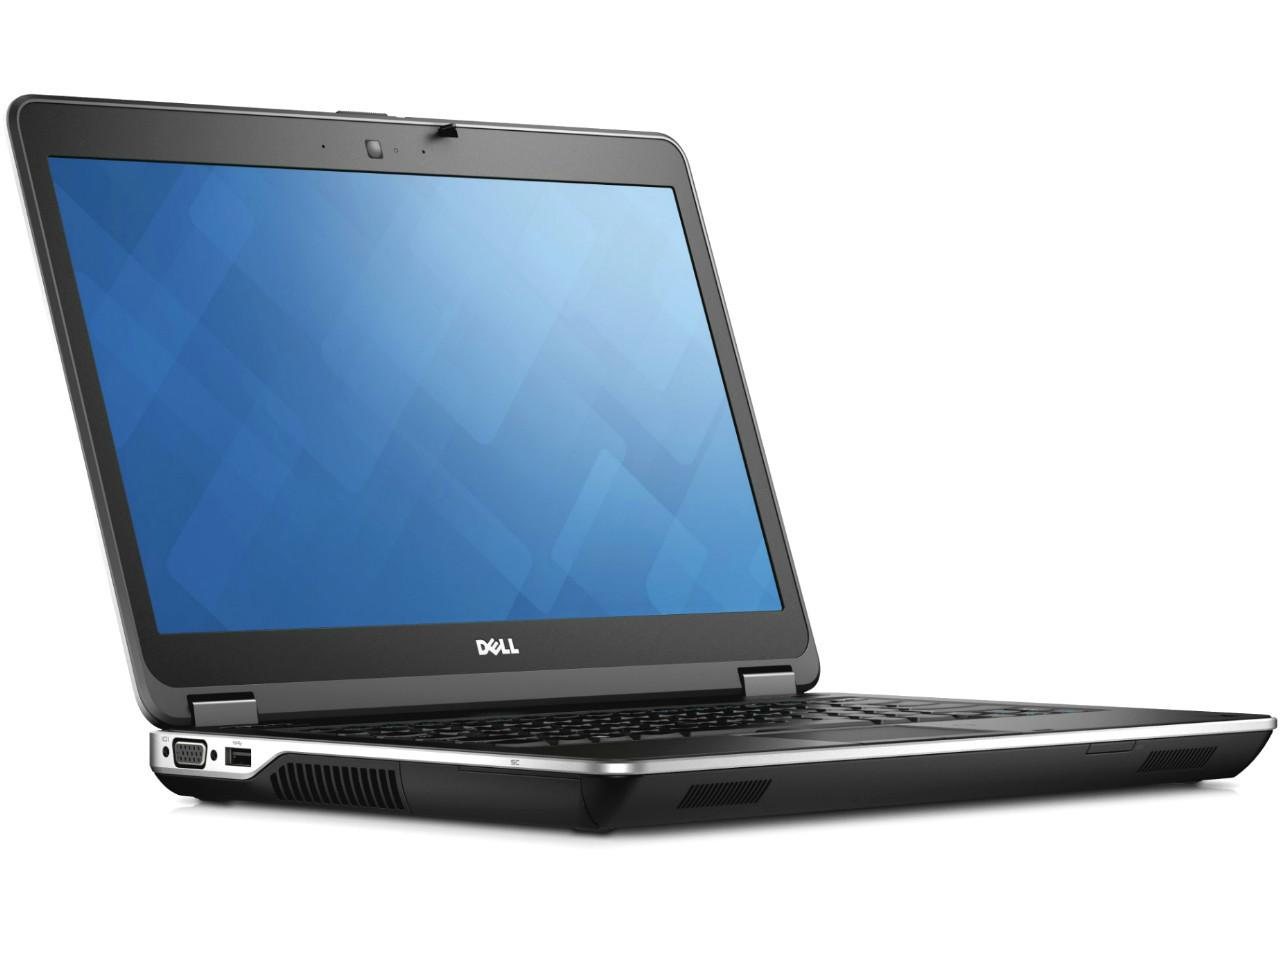 Dell Latitude E6440 Laptop Core i7 2.9GHz, 8GB Ram, 250GB SSD, DVD-RW, Windows 10 Pro 64 Notebook